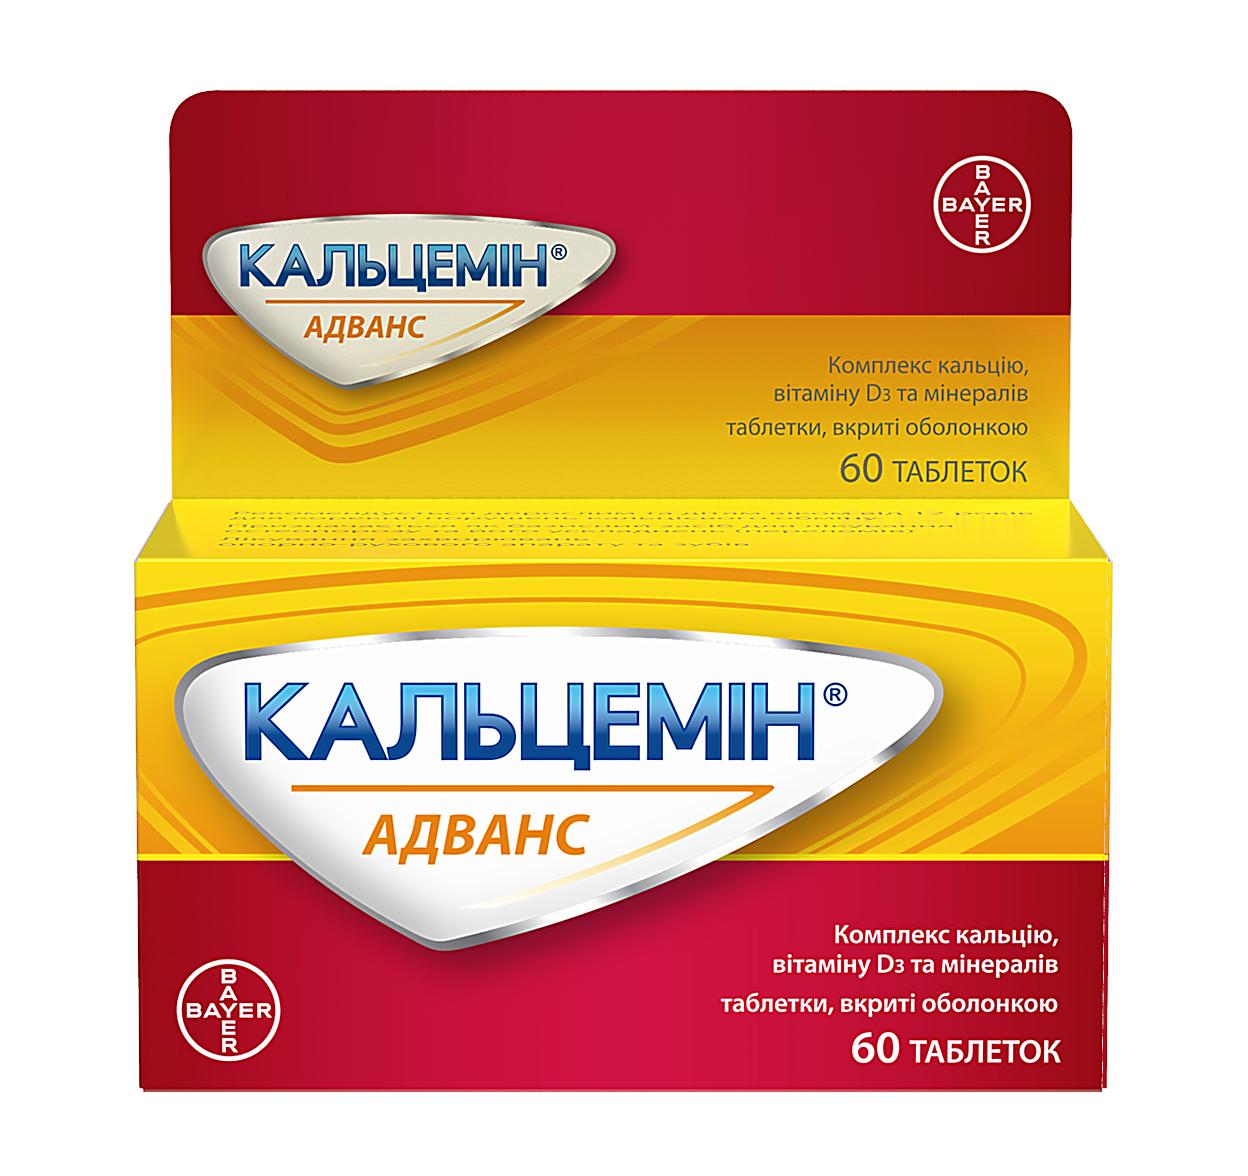 КАЛЬЦЕМИН АДВАНС ТАБ. №60